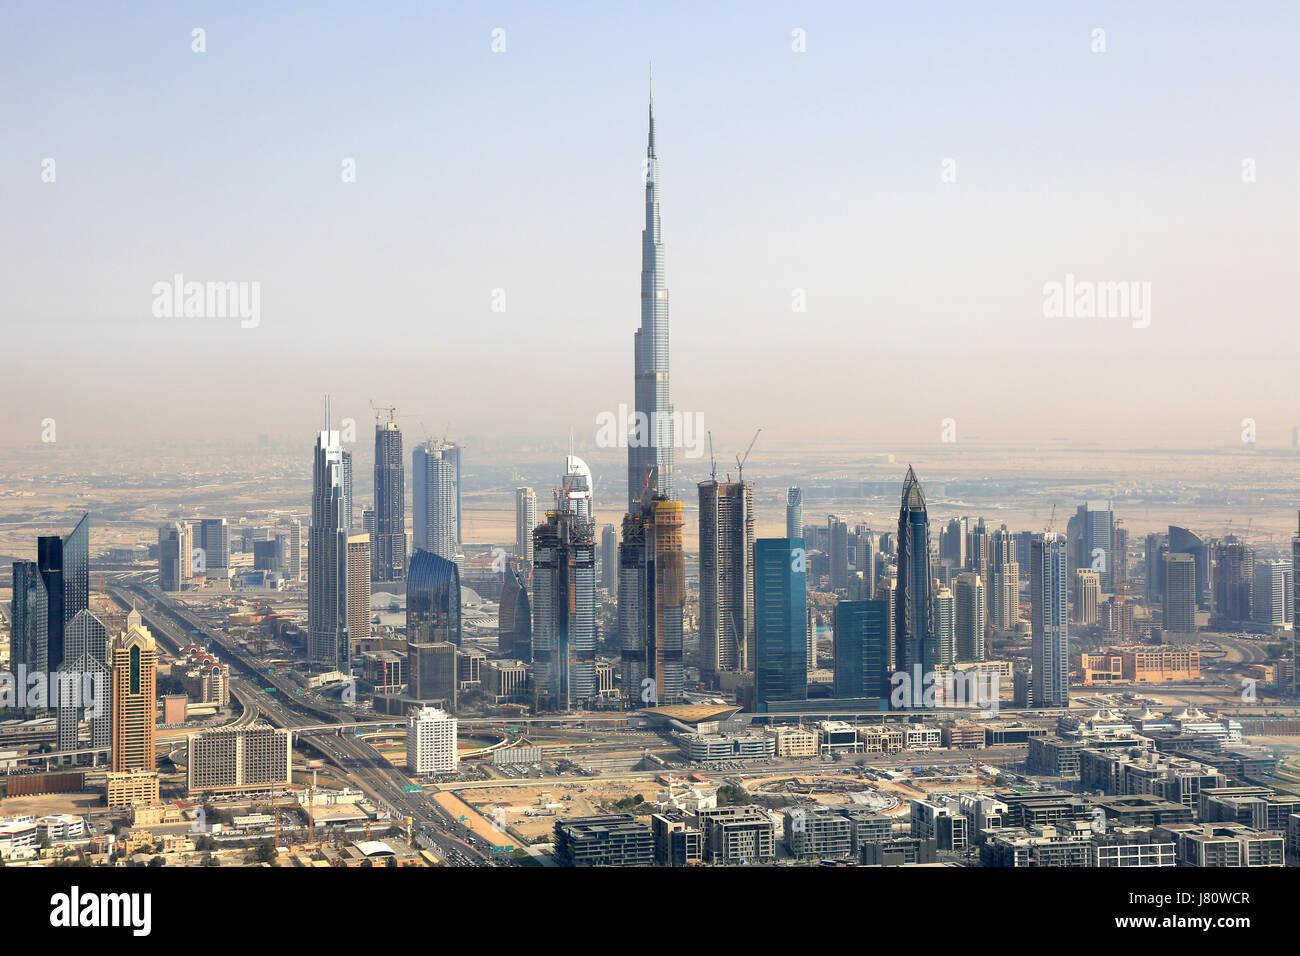 Dubai Burj Khalifa Downtown aerial view photography UAE Stock Photo